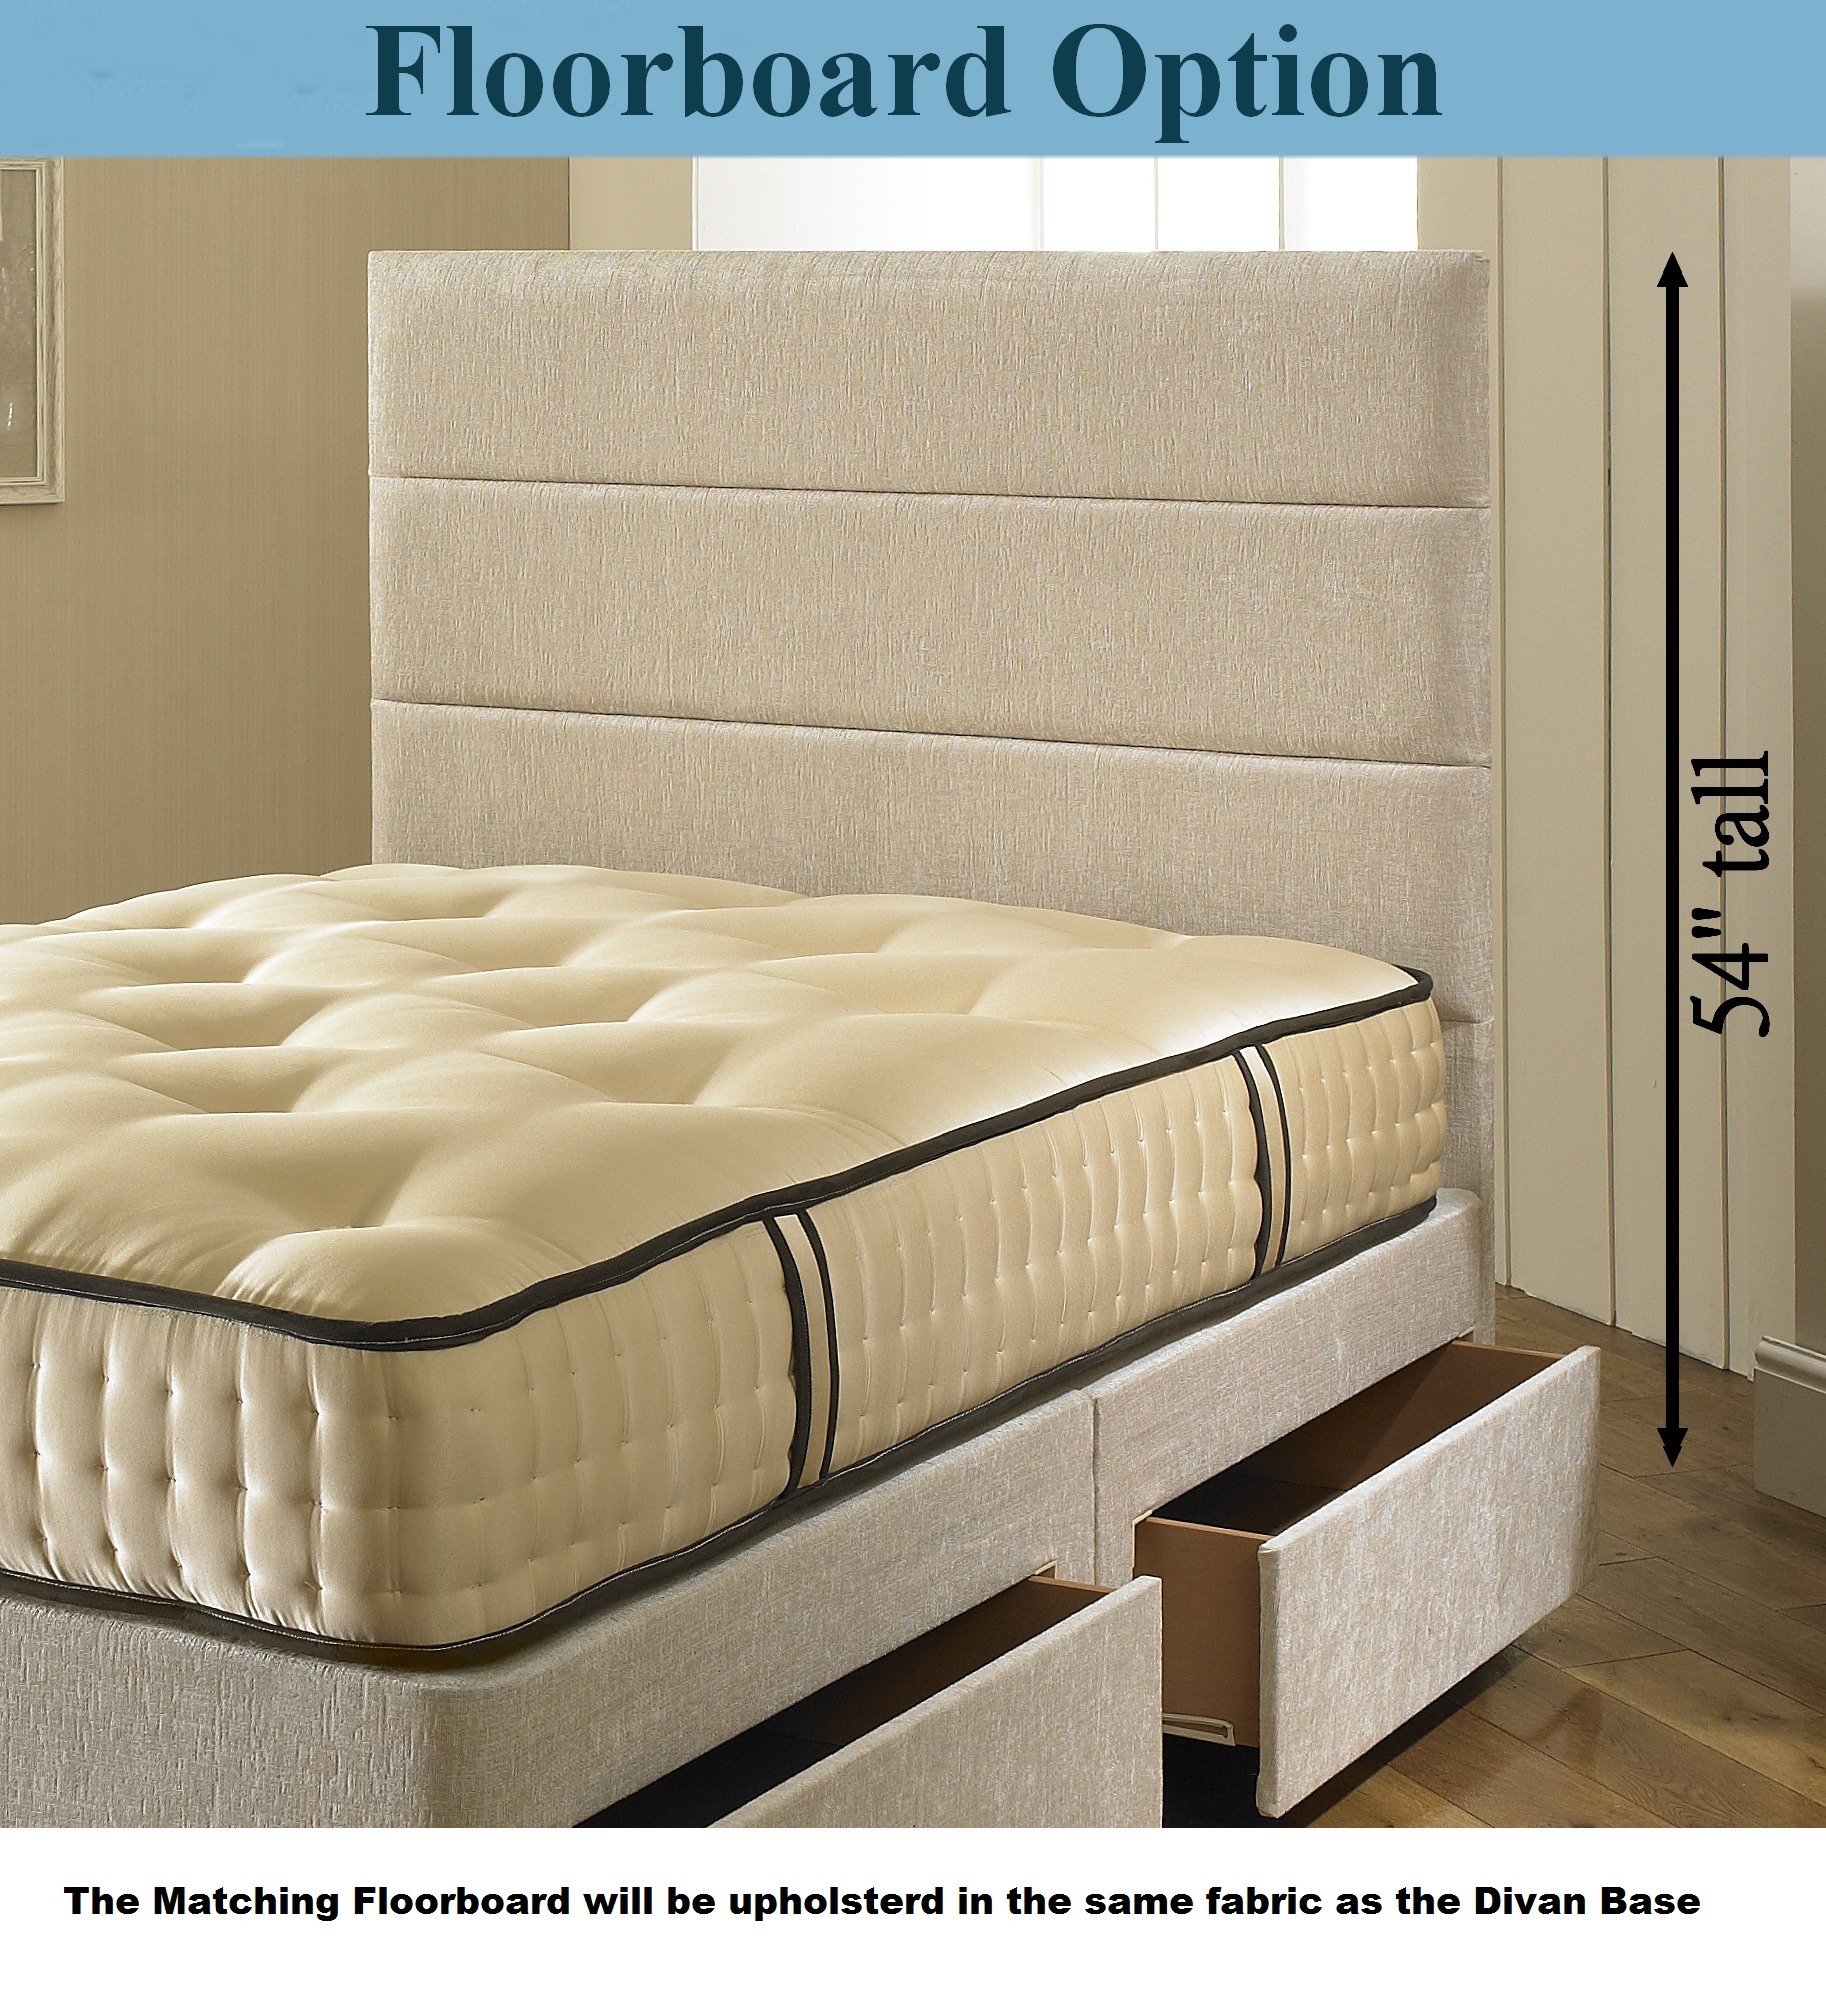 3000 pocket spring divan bed memory foam mattress 4ft6 for King size divan bed memory foam